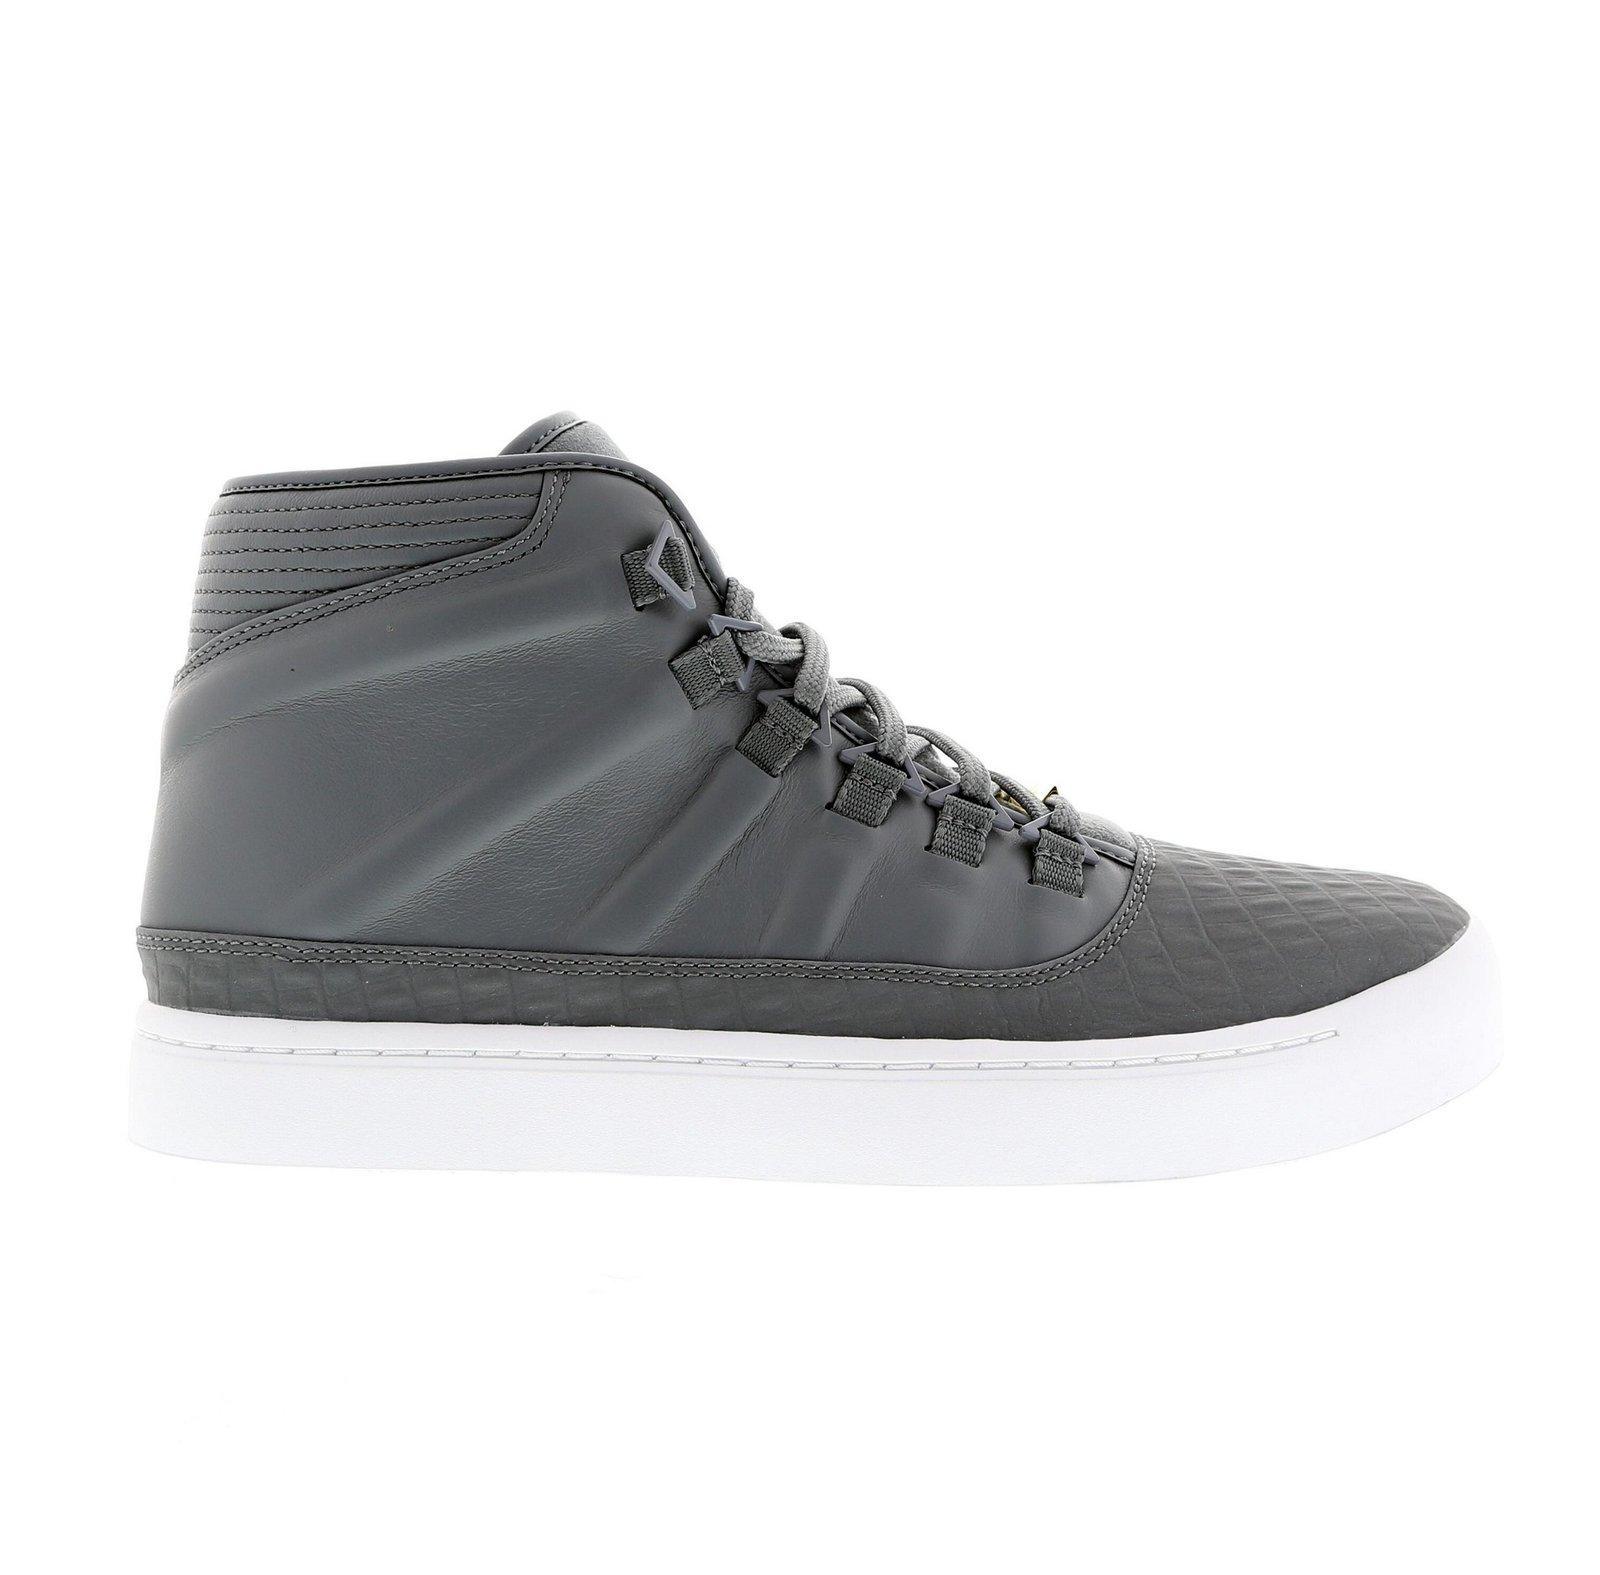 new style ec889 be77b nike air jordan westbrook 0 mens hi top trainers 768934 sneakers shoes (uk  9 .